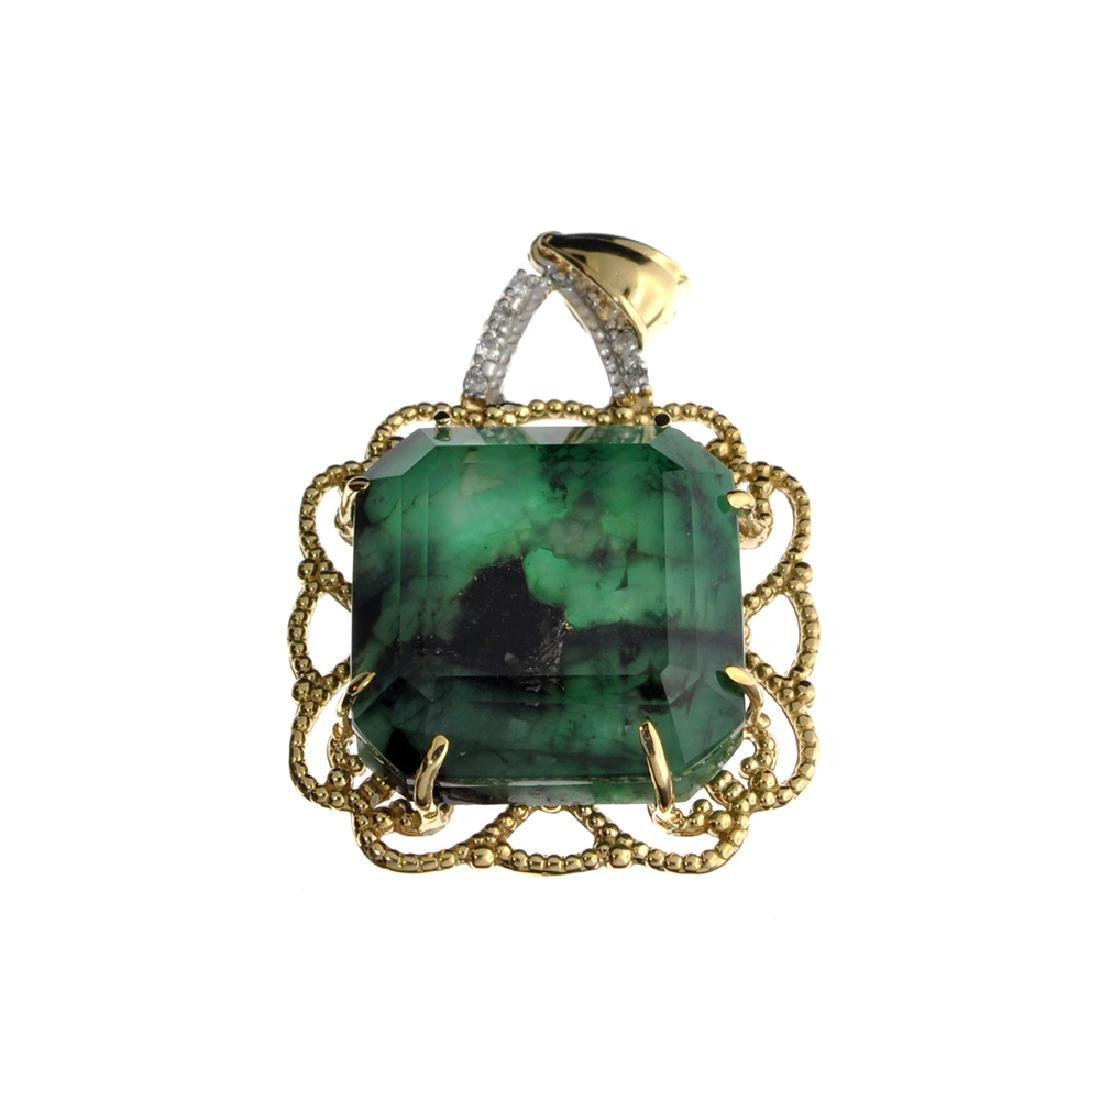 Fine Jewelry 14KT Gold, 25.55CT Square Cut Green